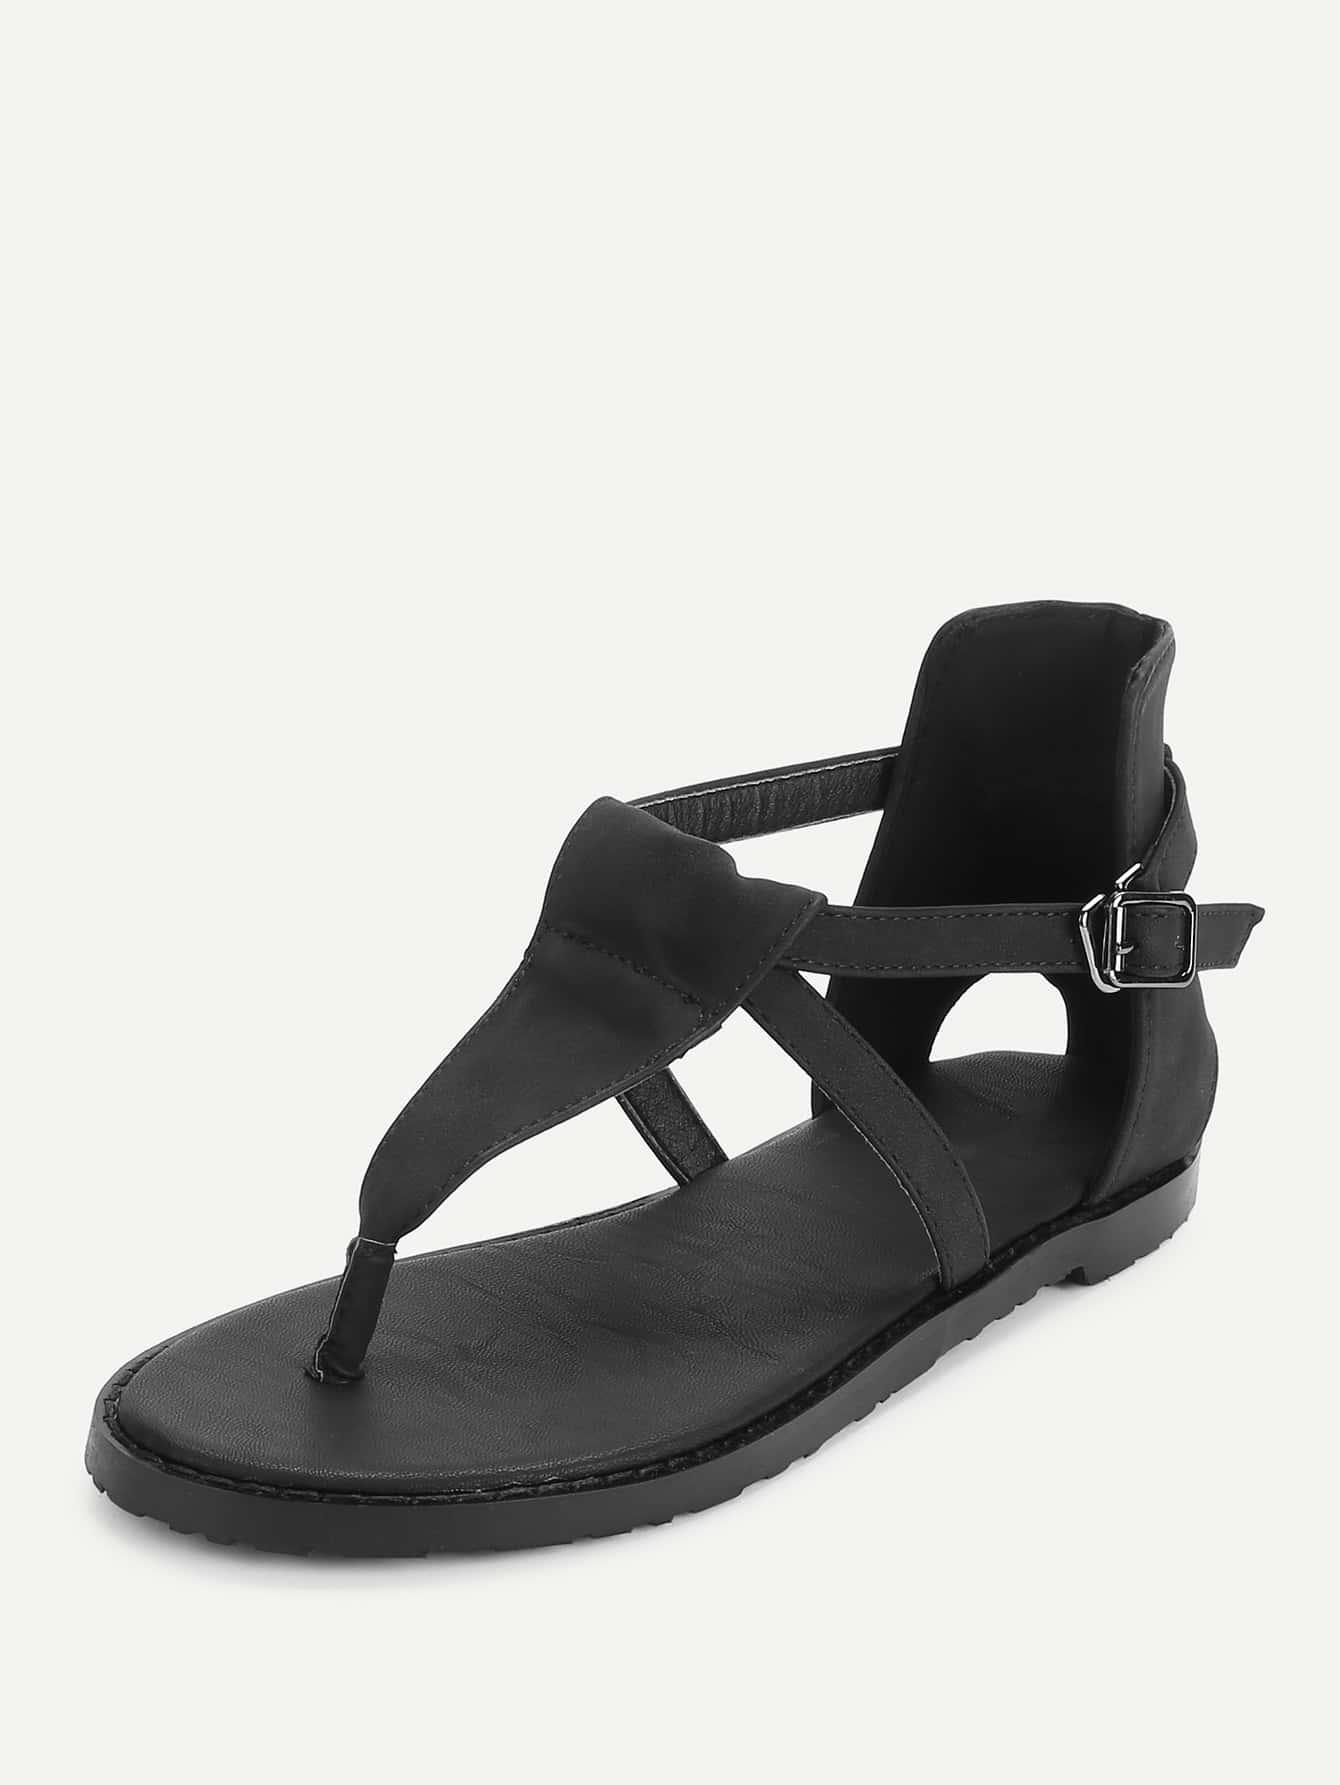 24b2bde832e Toe Post Strappy Flat Sandals -SheIn(Sheinside)